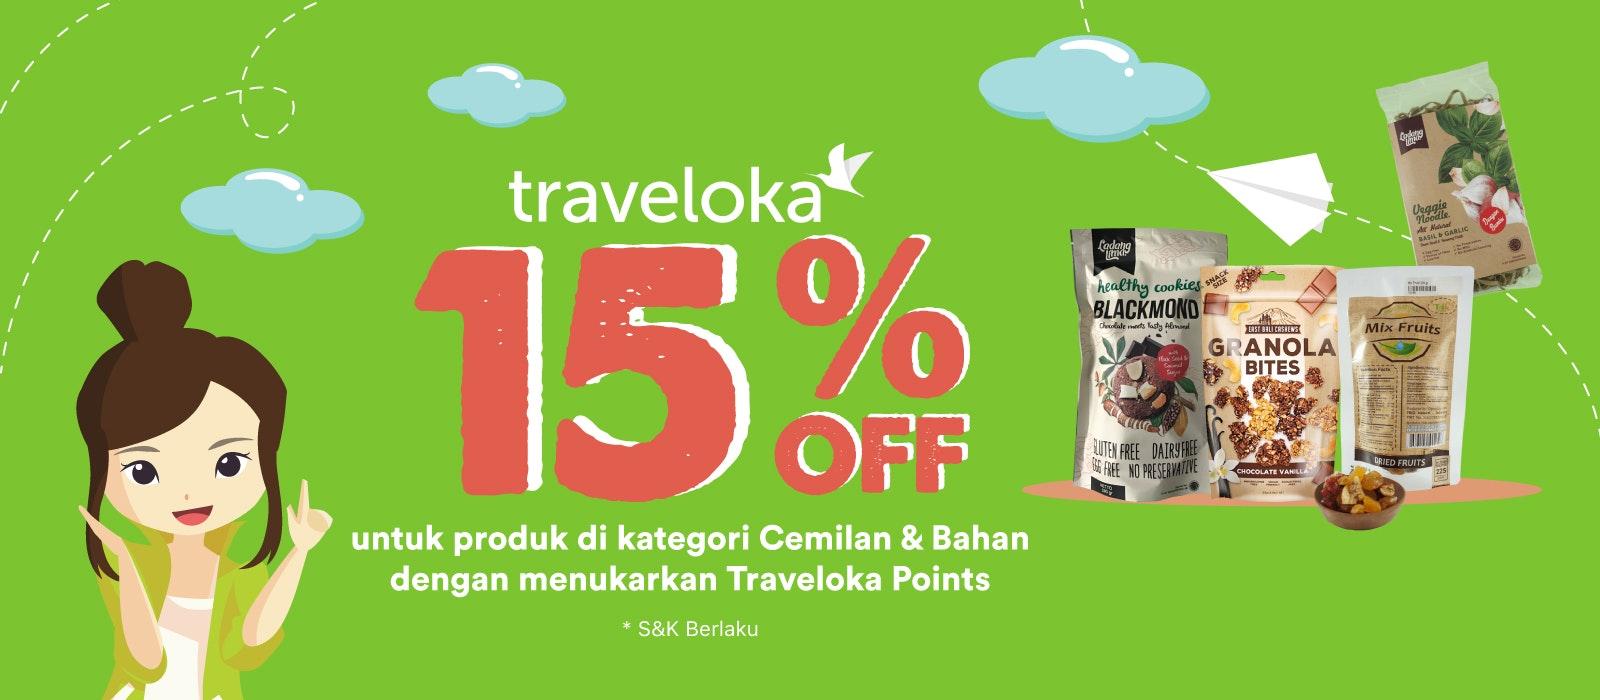 Produk Cemilan & Bahan 15% OFF dengan Traveloka Points